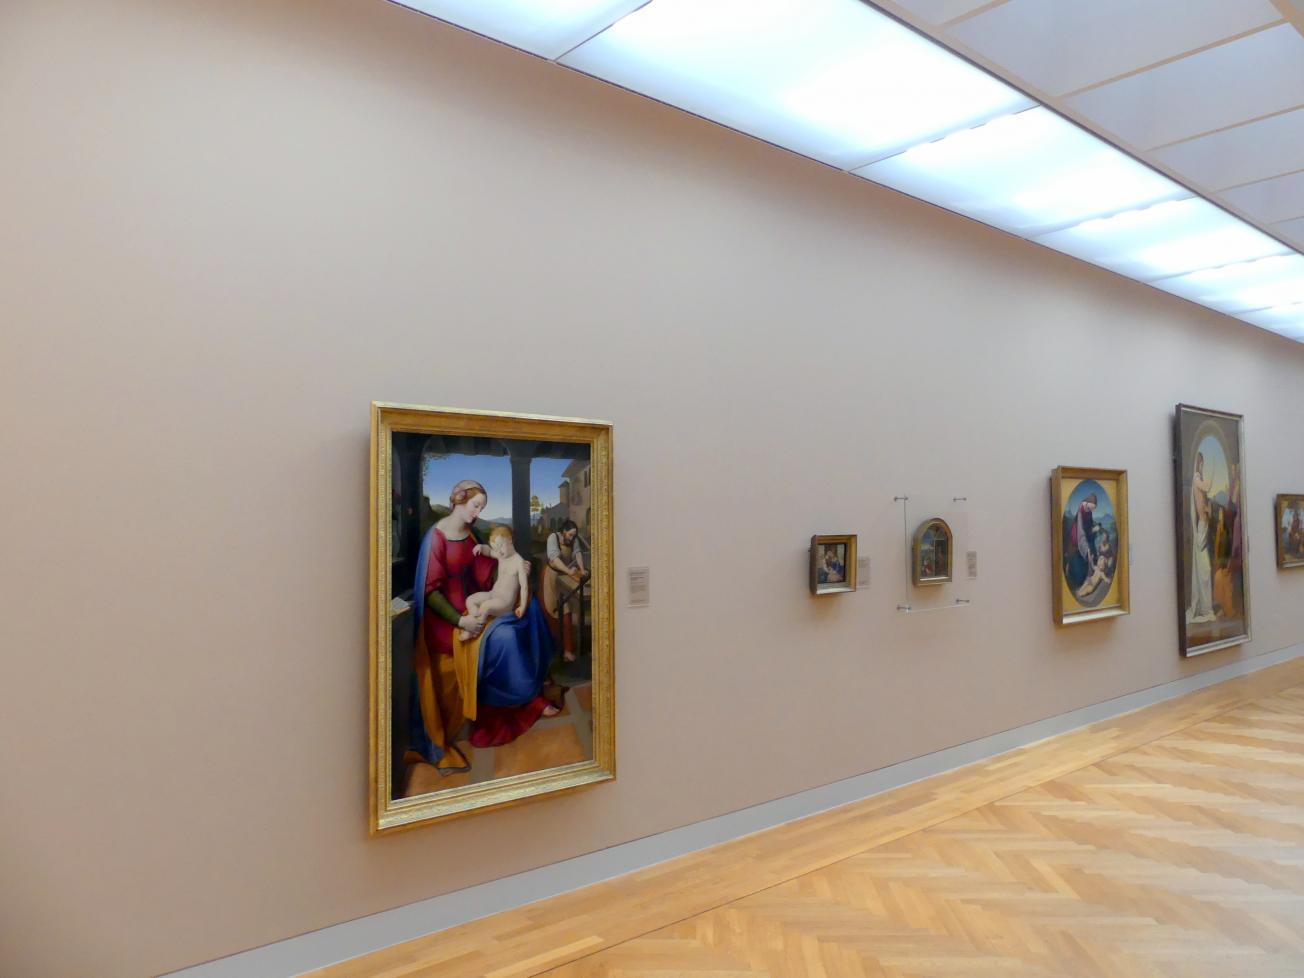 Schweinfurt, Museum Georg Schäfer, Saal 12, Bild 1/5